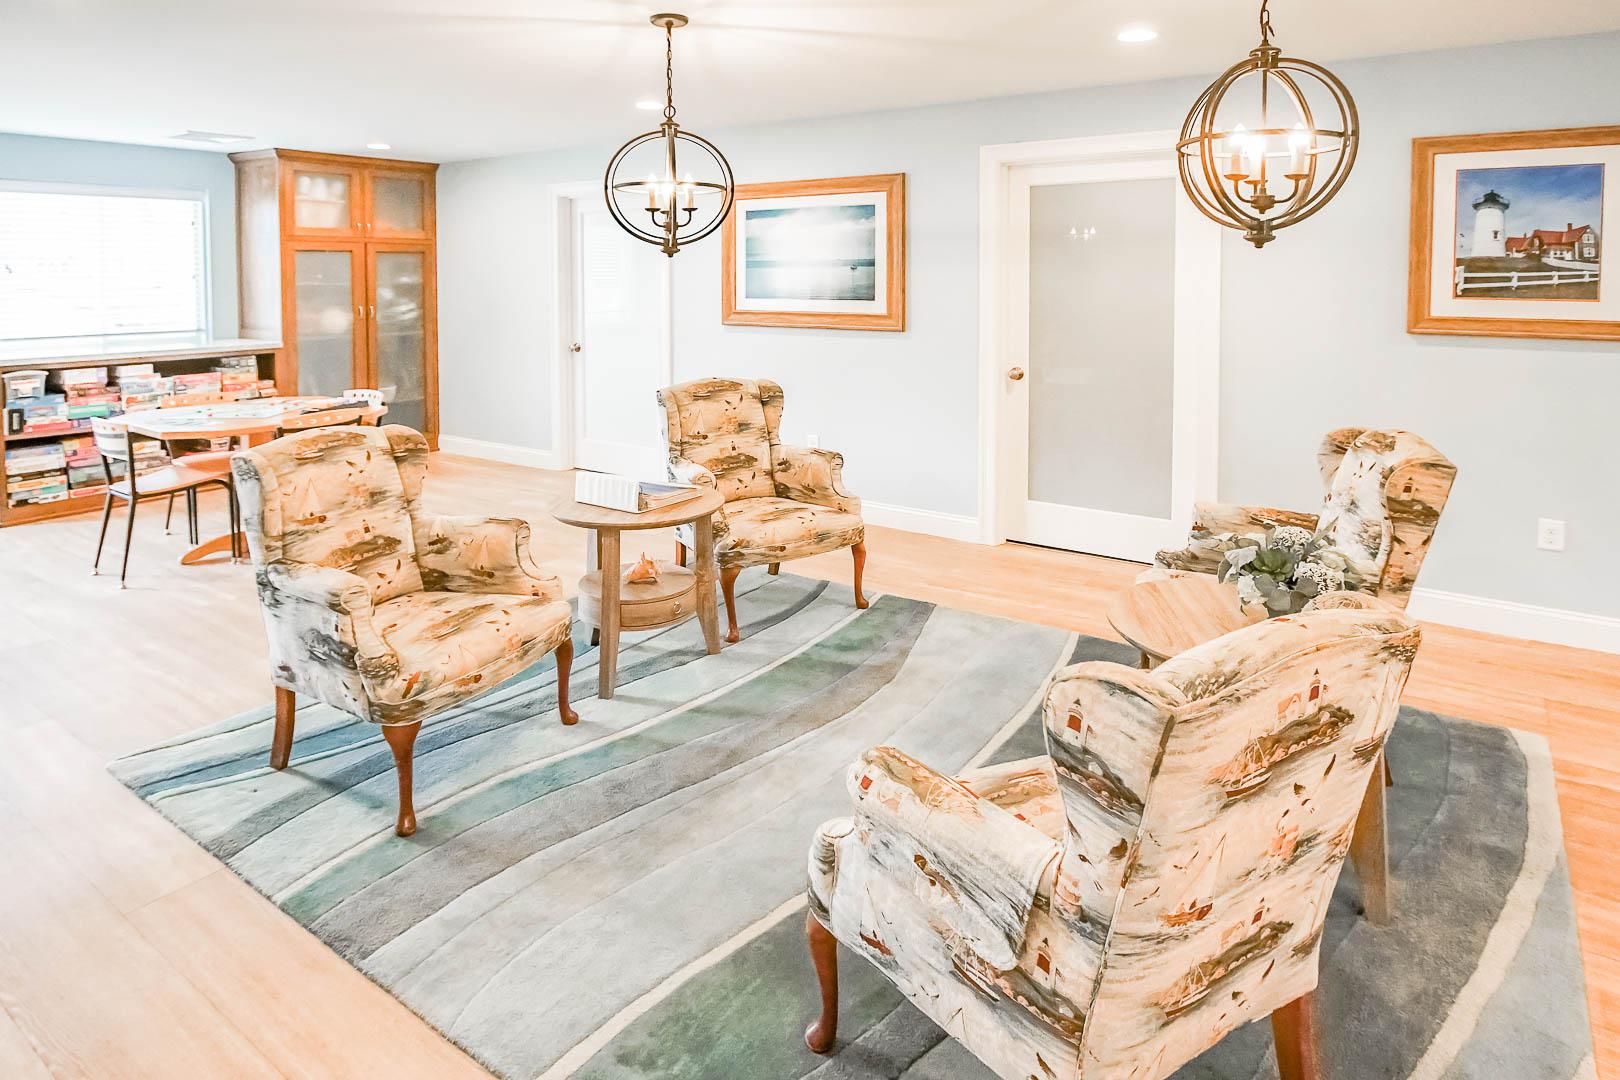 A vibrant lobby area at VRI's Brewster Green Resort in Massachusetts.